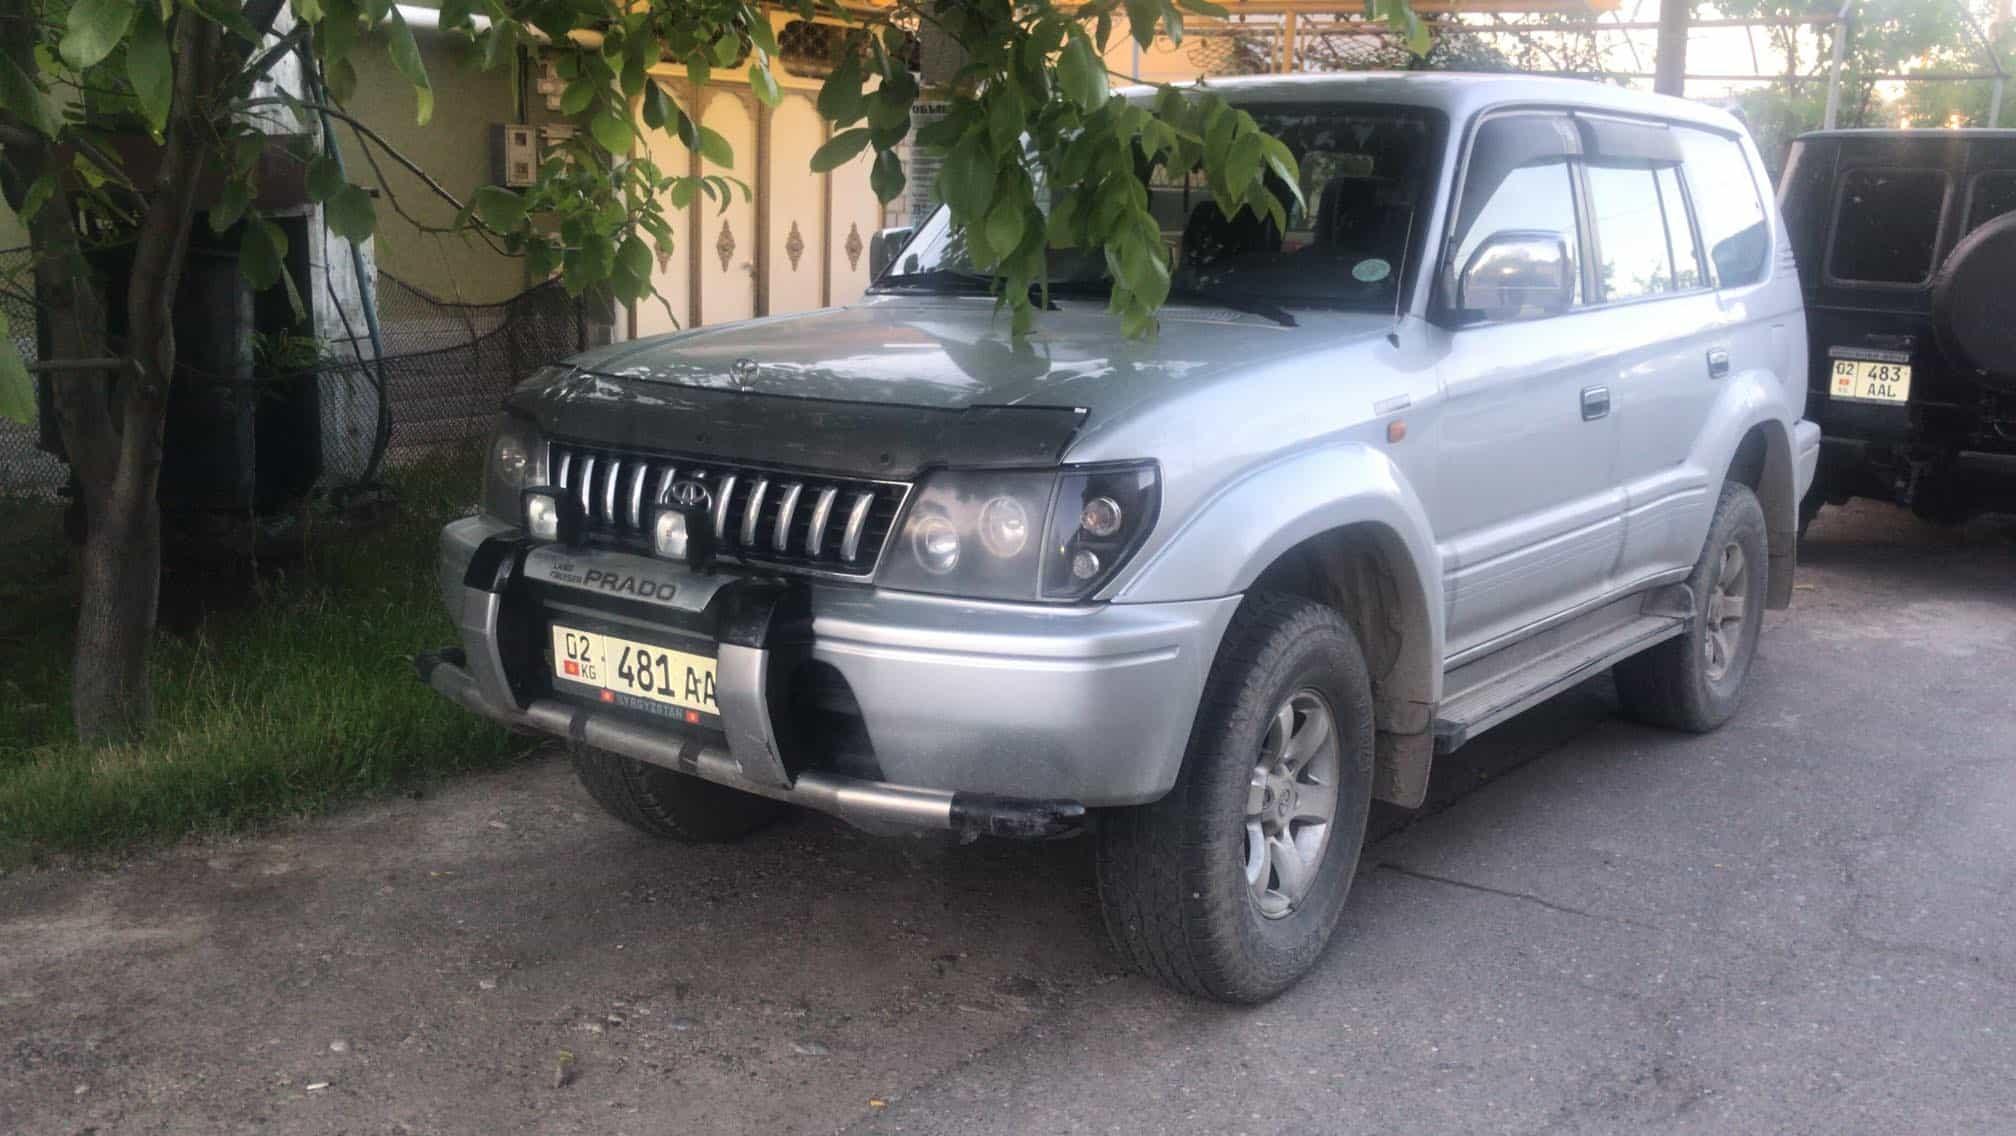 Toyota Land Cruiser Prado 4x4 95 series à louer au Kirghizistan